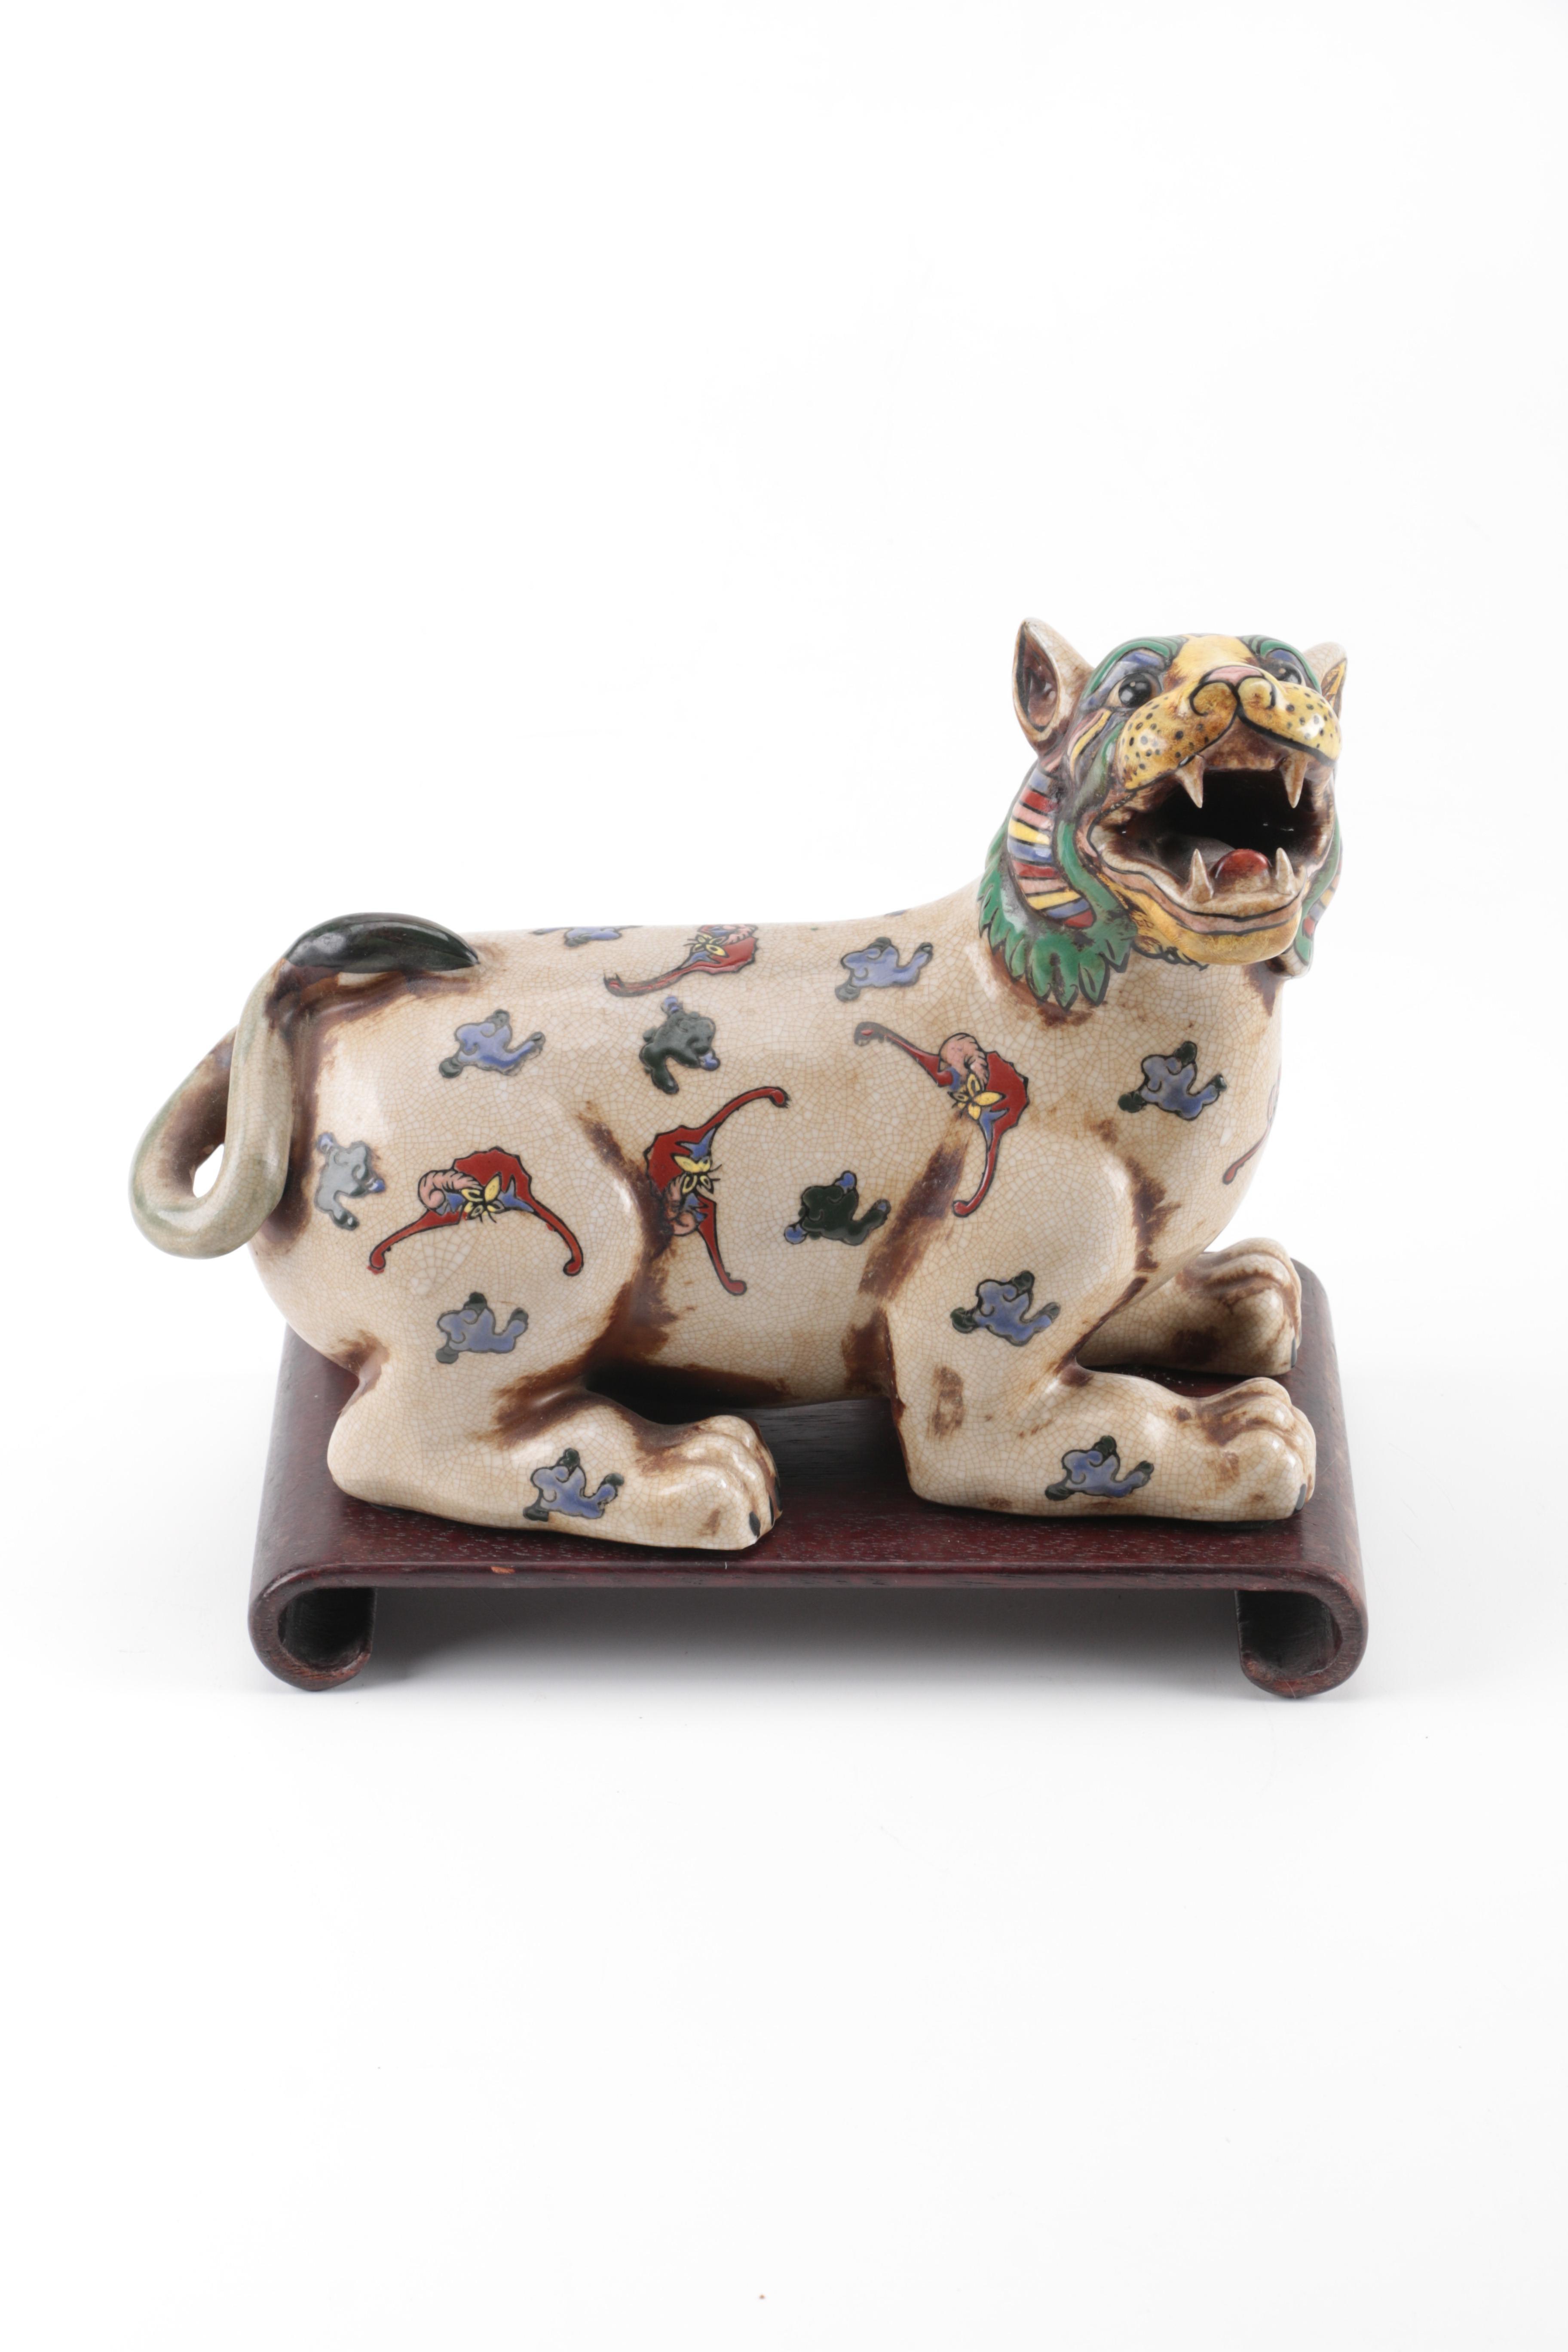 Chinese Colorful Ceramic Lion Figurine